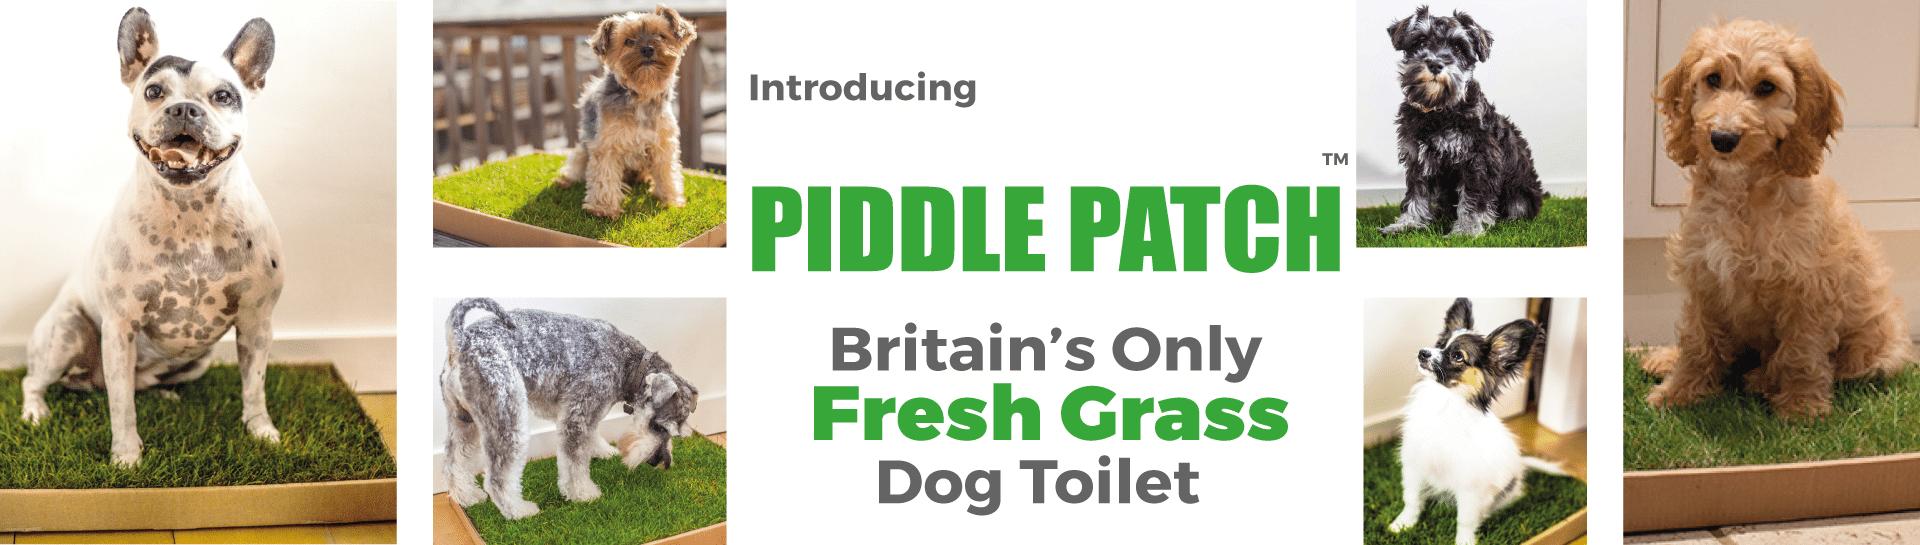 Britain's only fresh grass dog litter